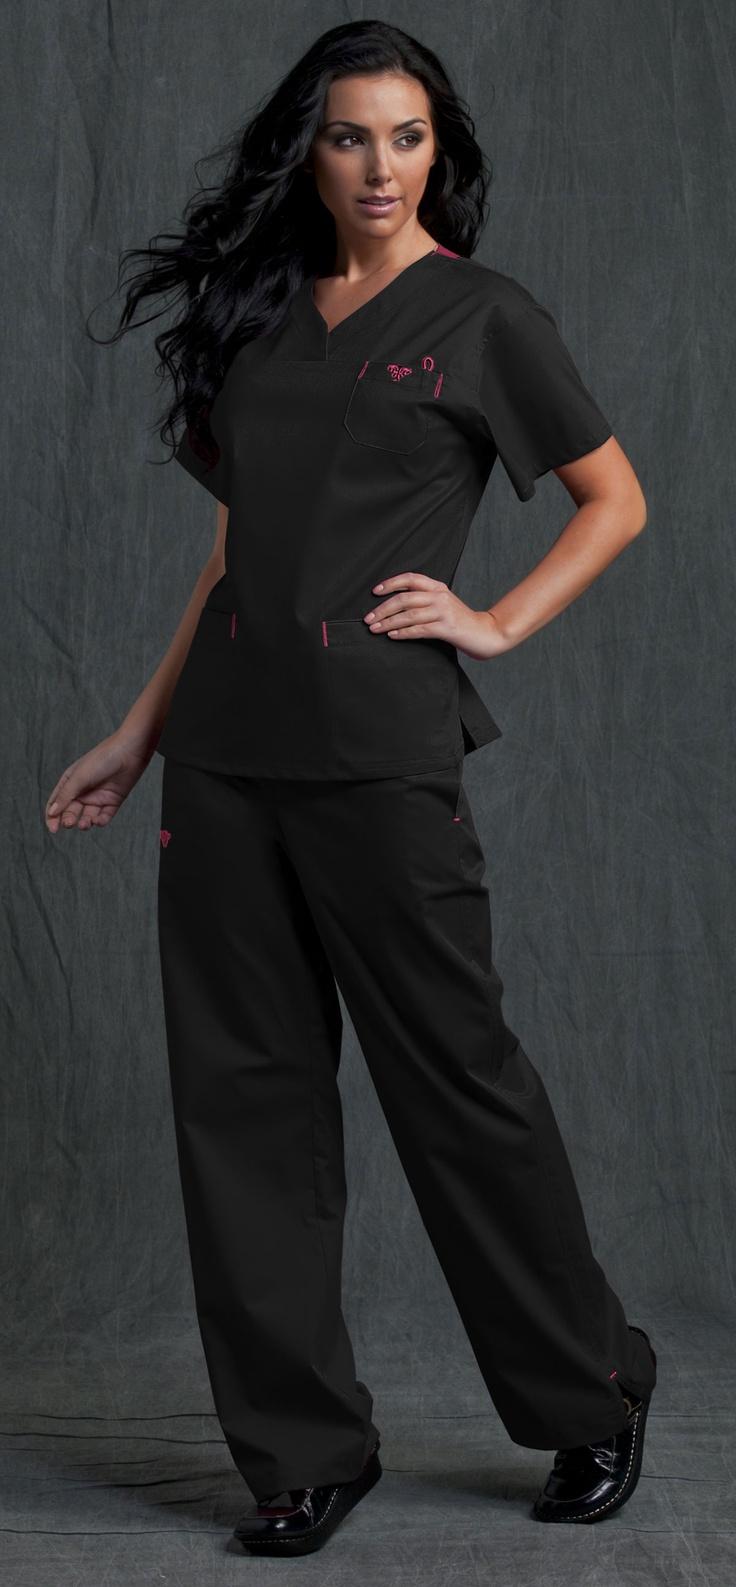 cute scrubs. wish we could wear our own scrubs!